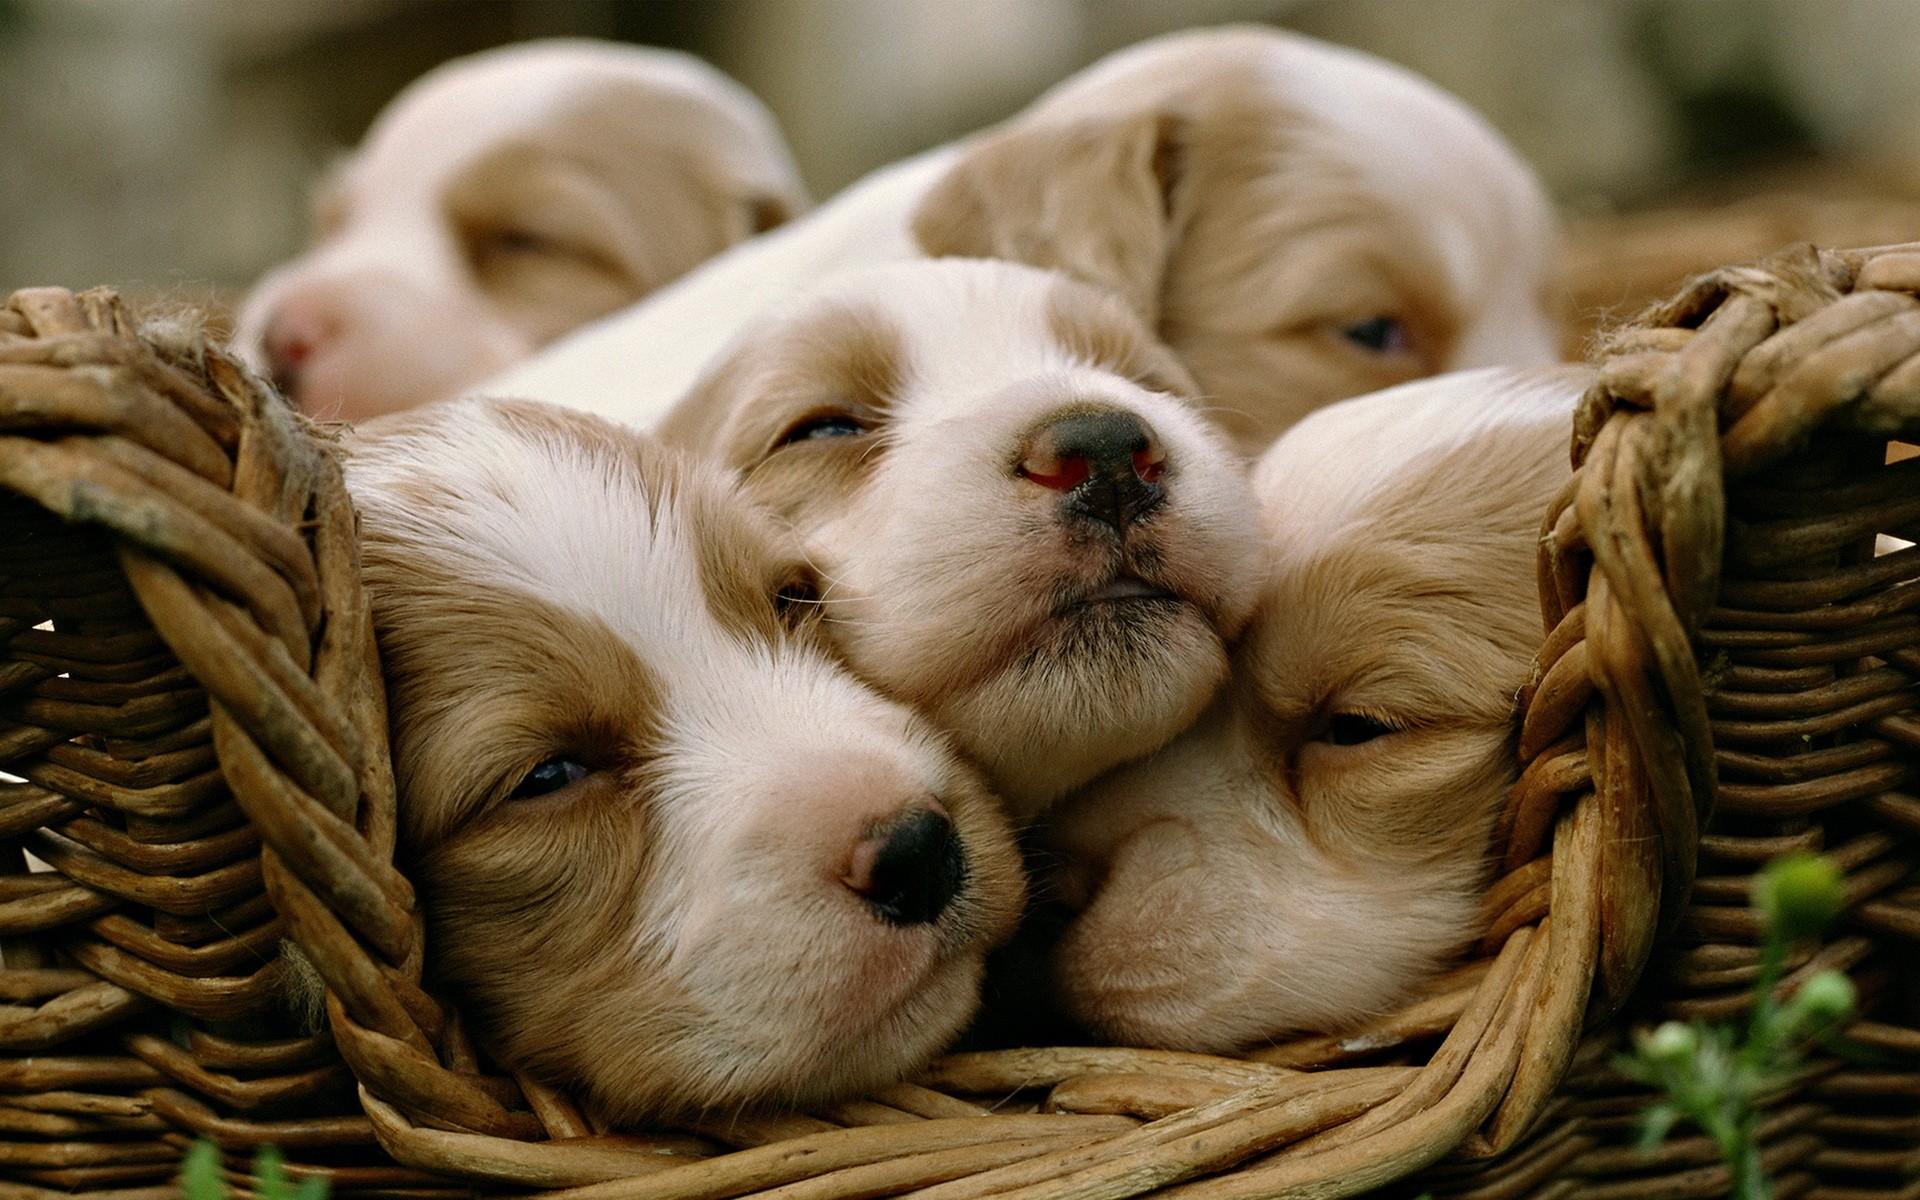 Dogs Wallpaper 1920x1200 36590